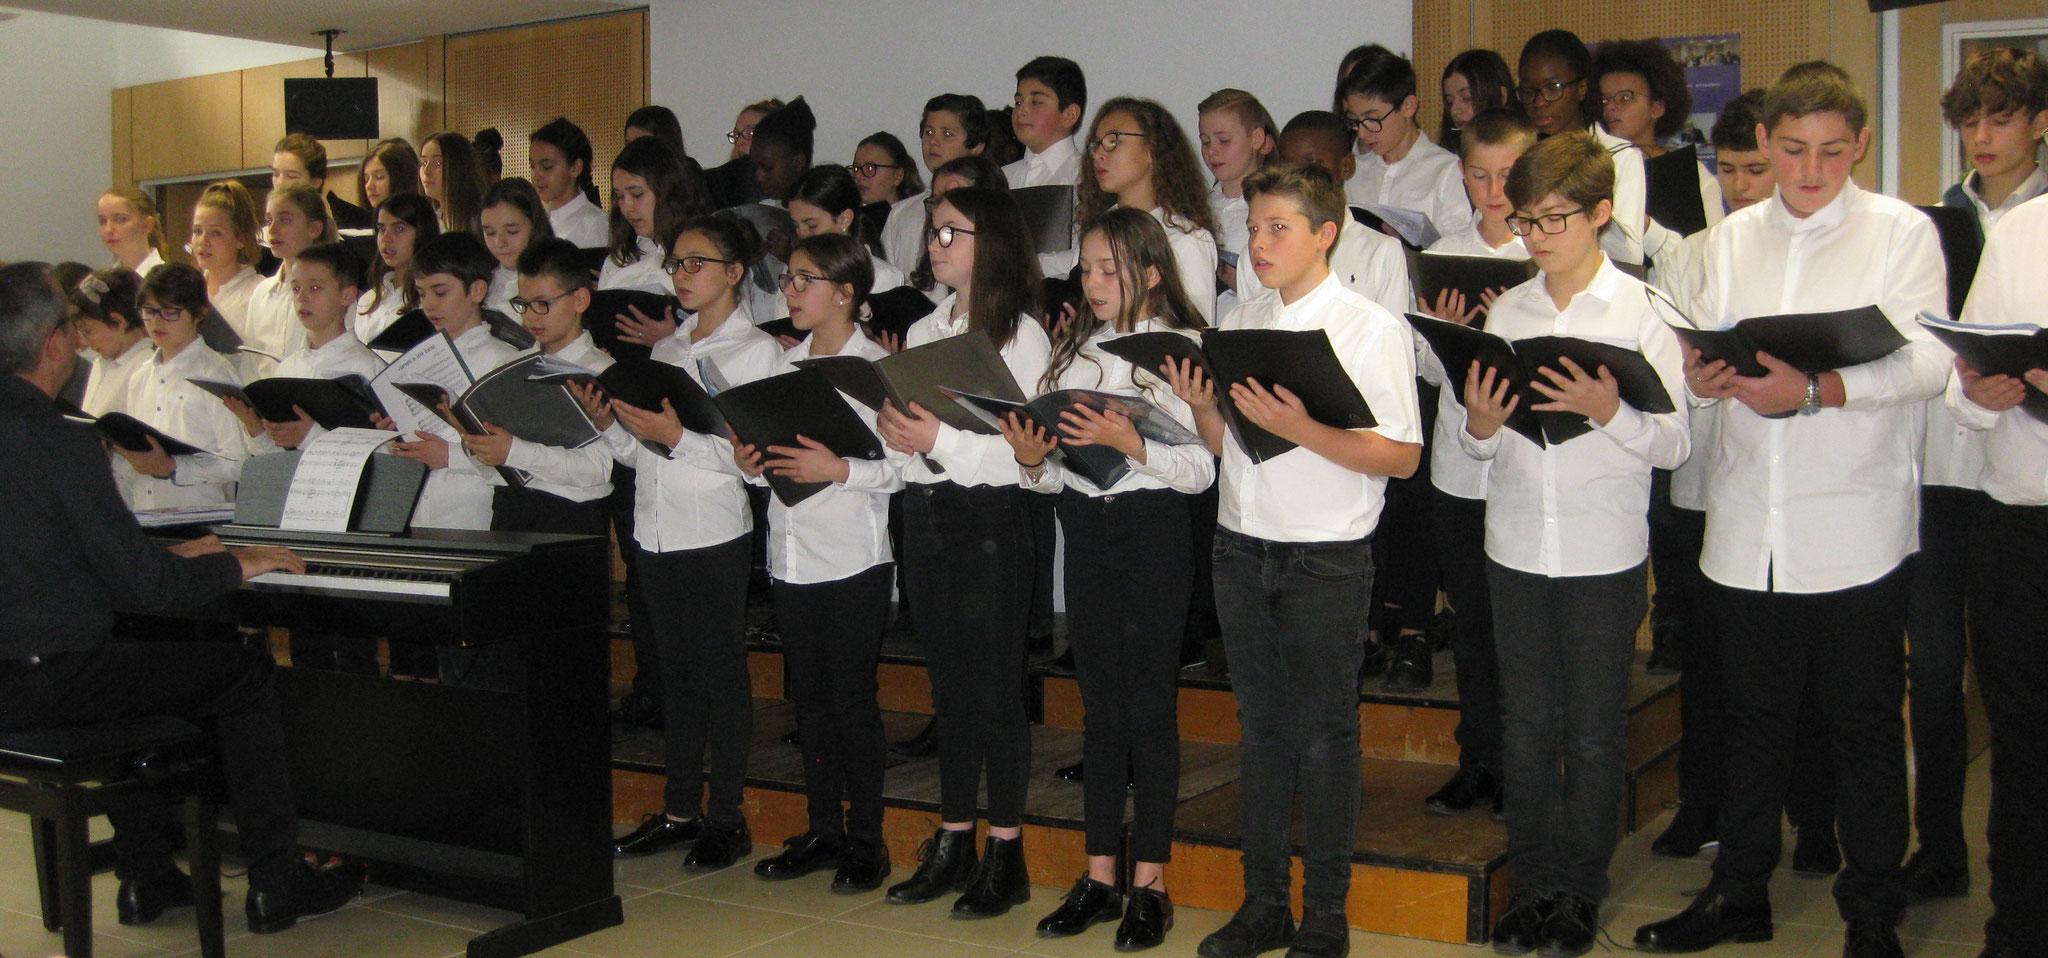 La chorale du collège Terres rouges d'Épernay.